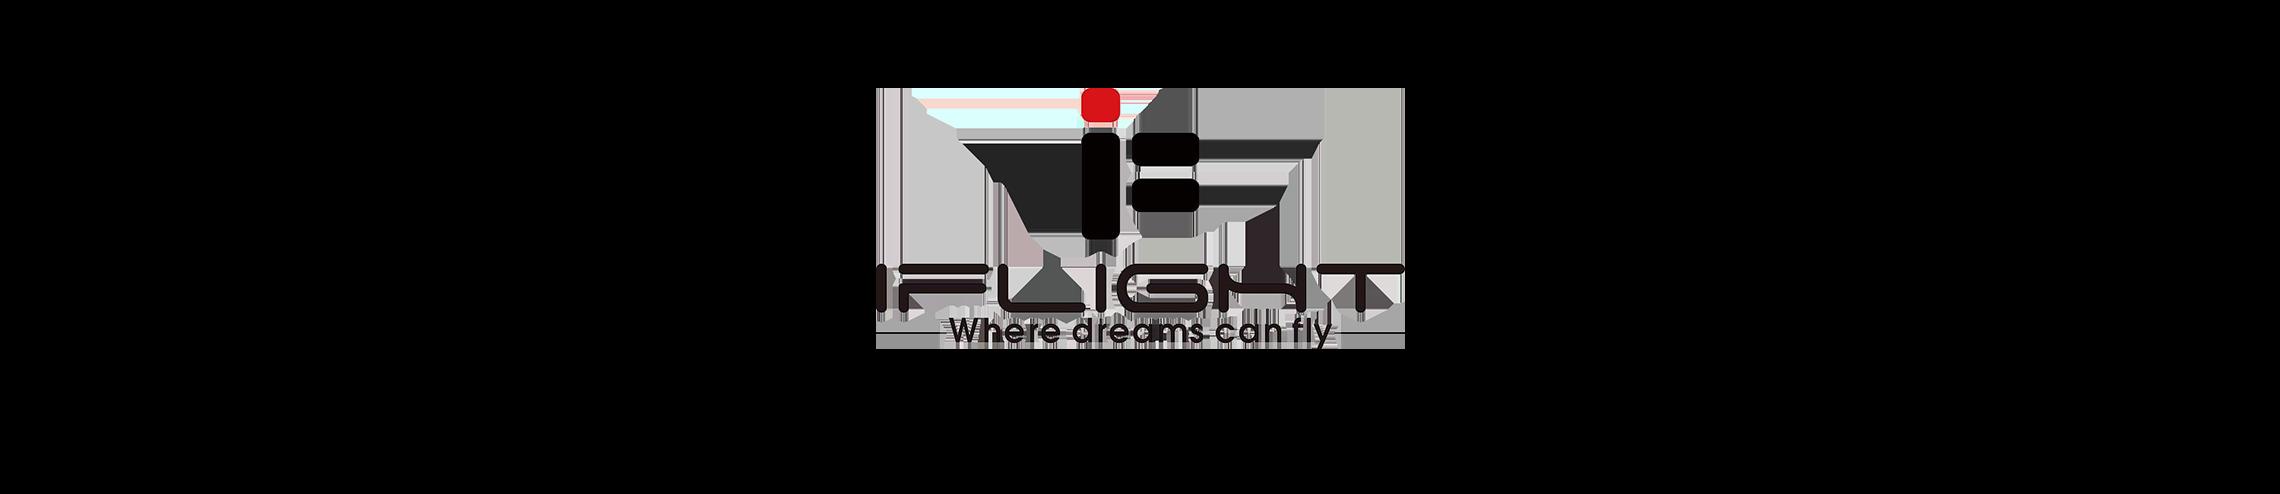 iflight fpv banner promotion shop description mantisfpv